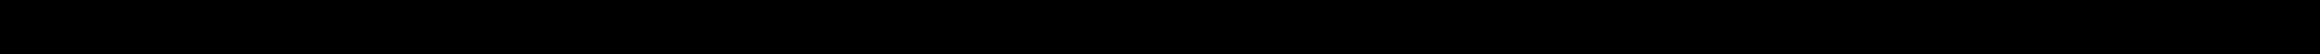 DENSO I80, J4520IWF24, 09482-00061, 09482-00187, 99000-69835-B8R Tændrør